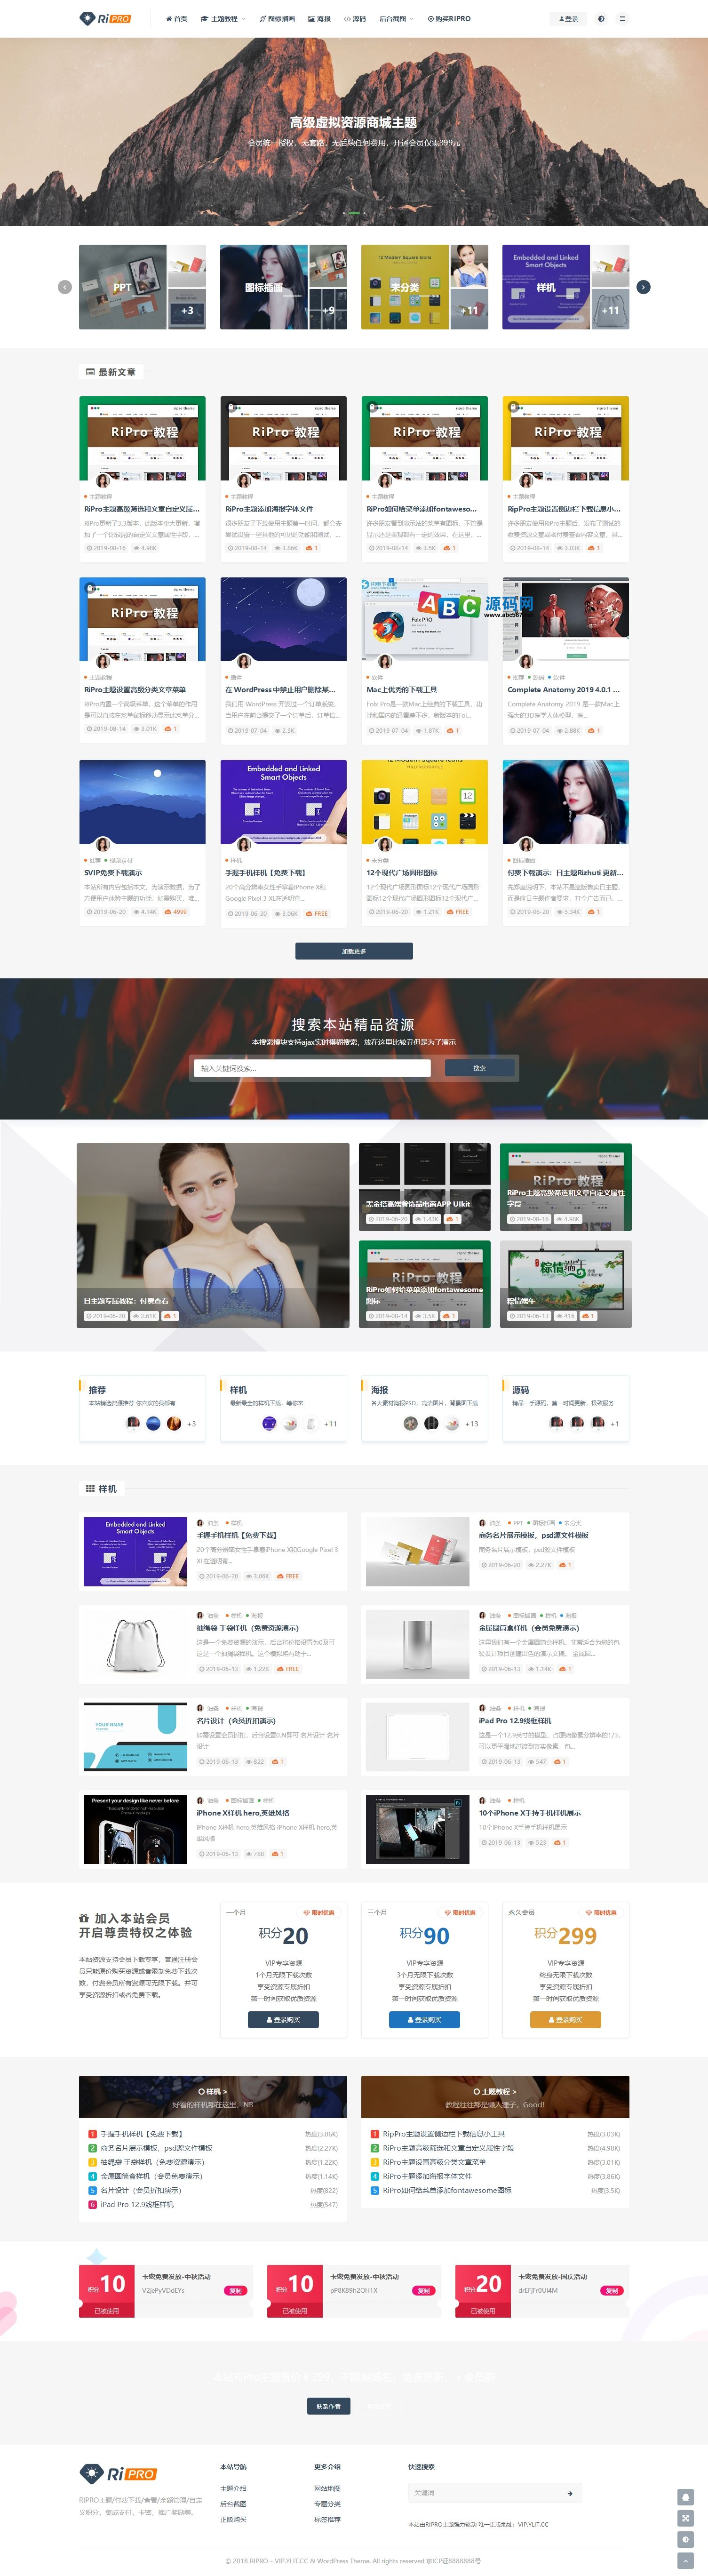 WordPress主题 RiPro v5.0高级付费素材资源类主题-52资源网